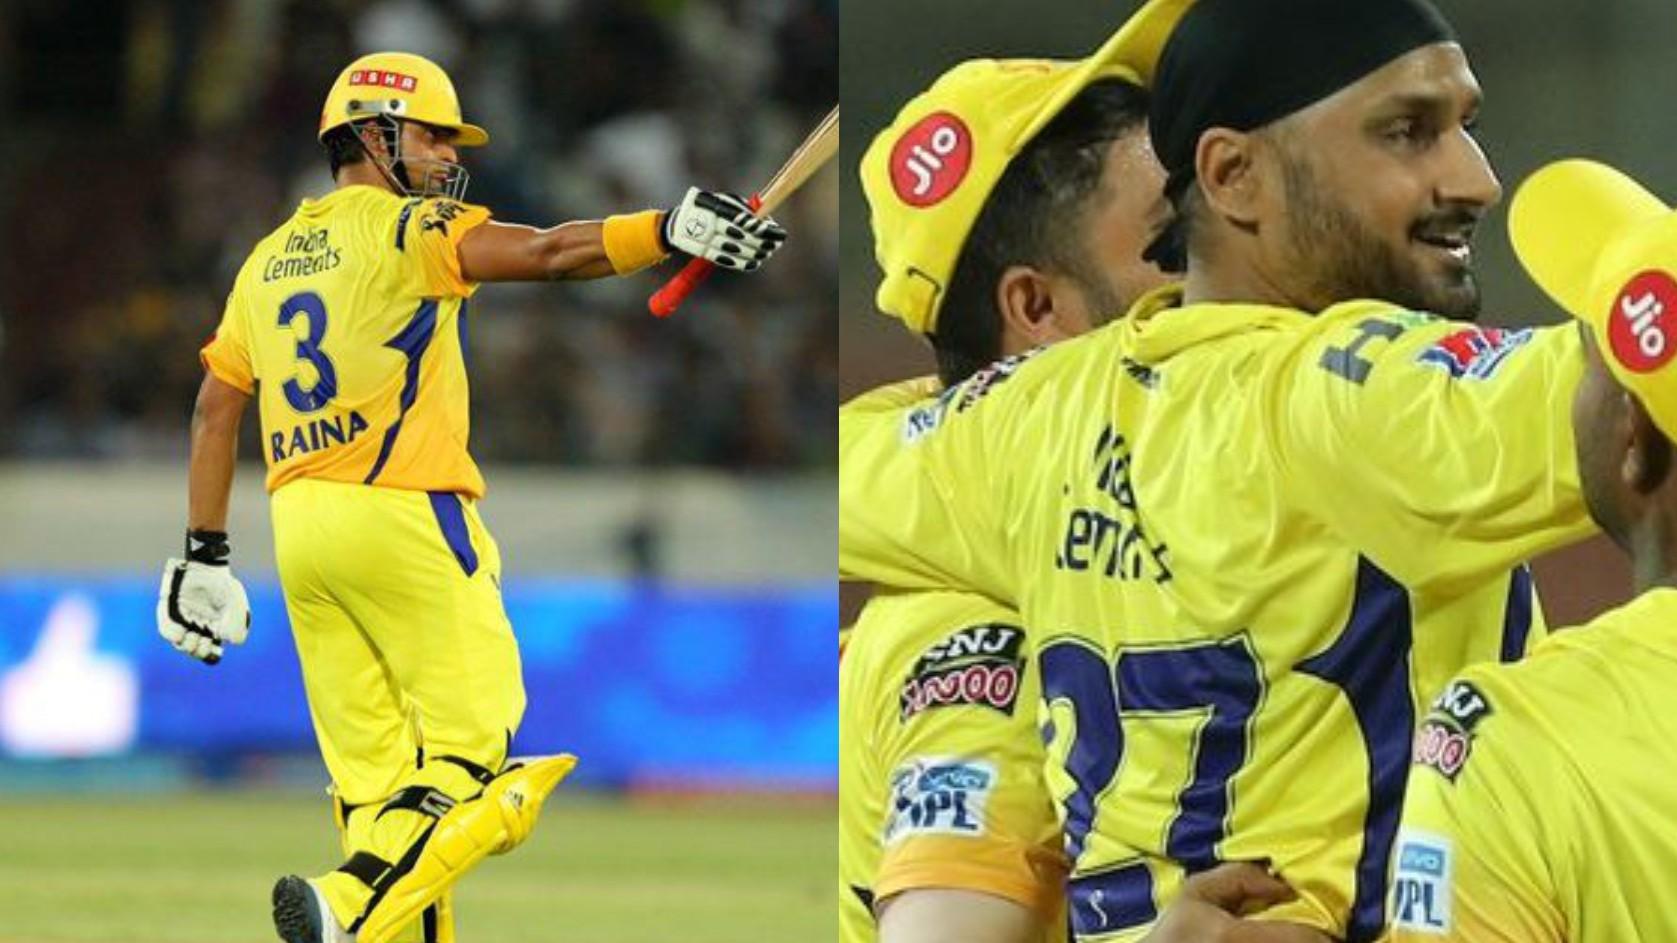 CSK reveals Harbhajan Singh's lovely gesture for Suresh Raina over jersey number